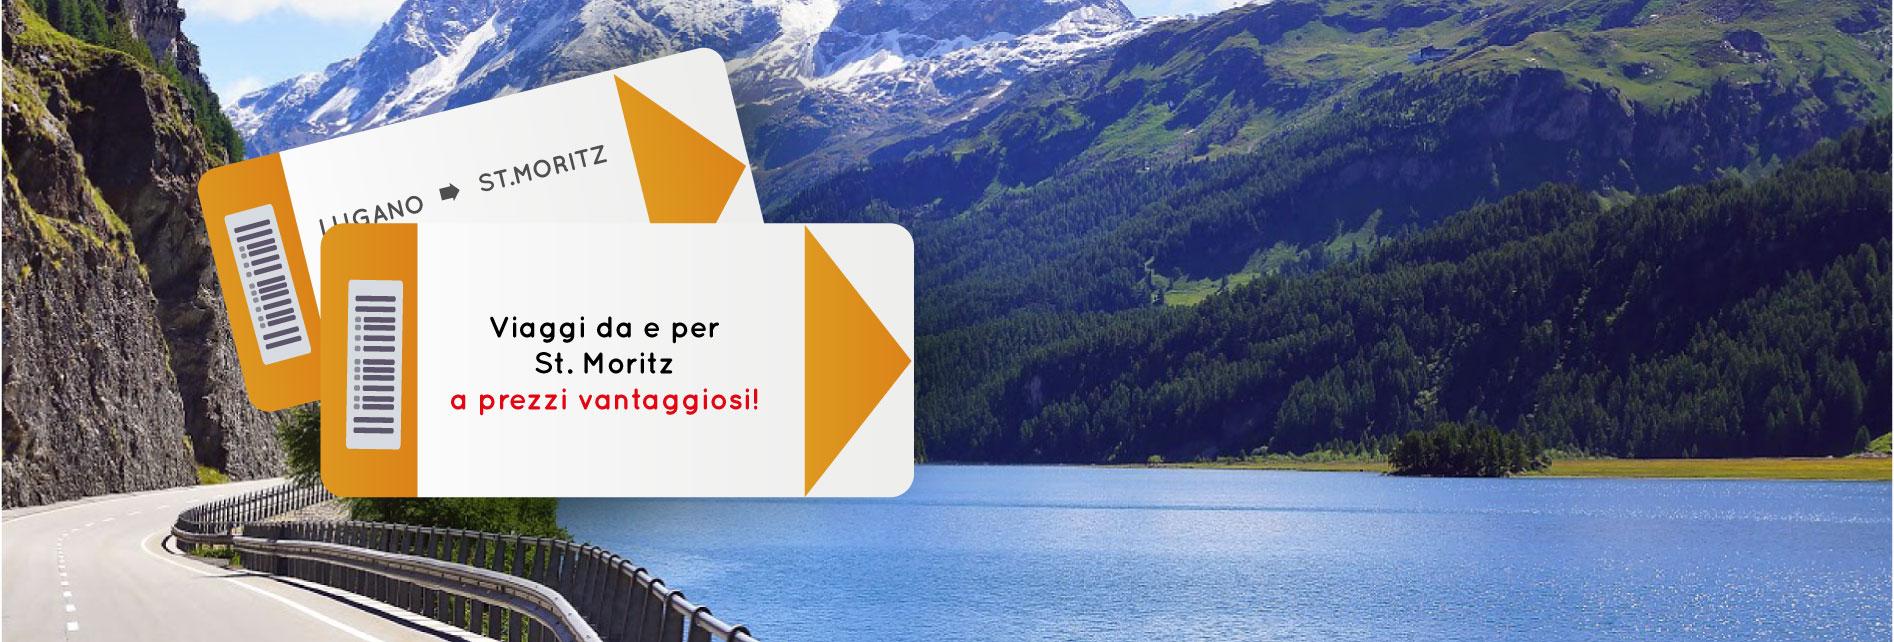 Viaggi da e per St Moritz a prezzi vantaggiosi